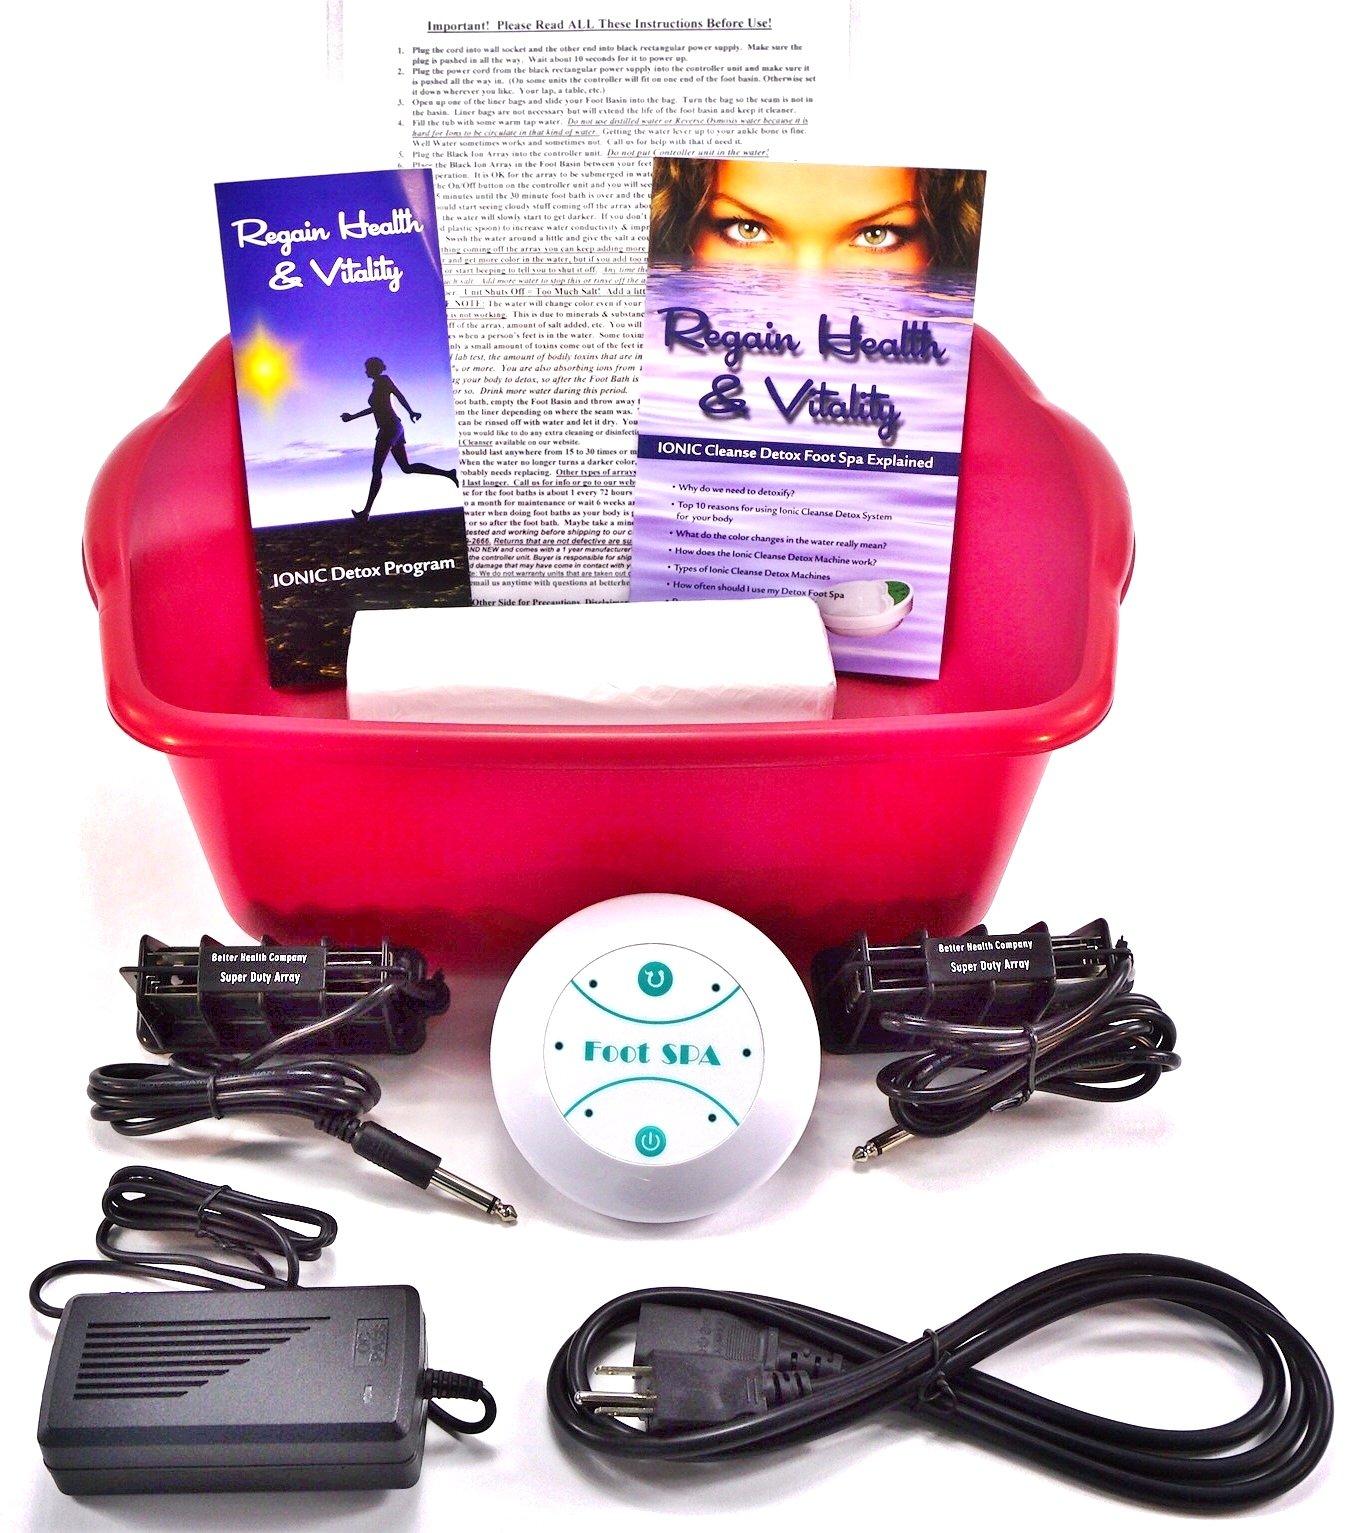 Ionic Foot Cleanse. Foot Bath Spa. Detox Foot Spa Machine. 2 Super Duty Arrays an extra $60.00 Value. FREE Reagin Health & Vitality Booklet & Brochure.